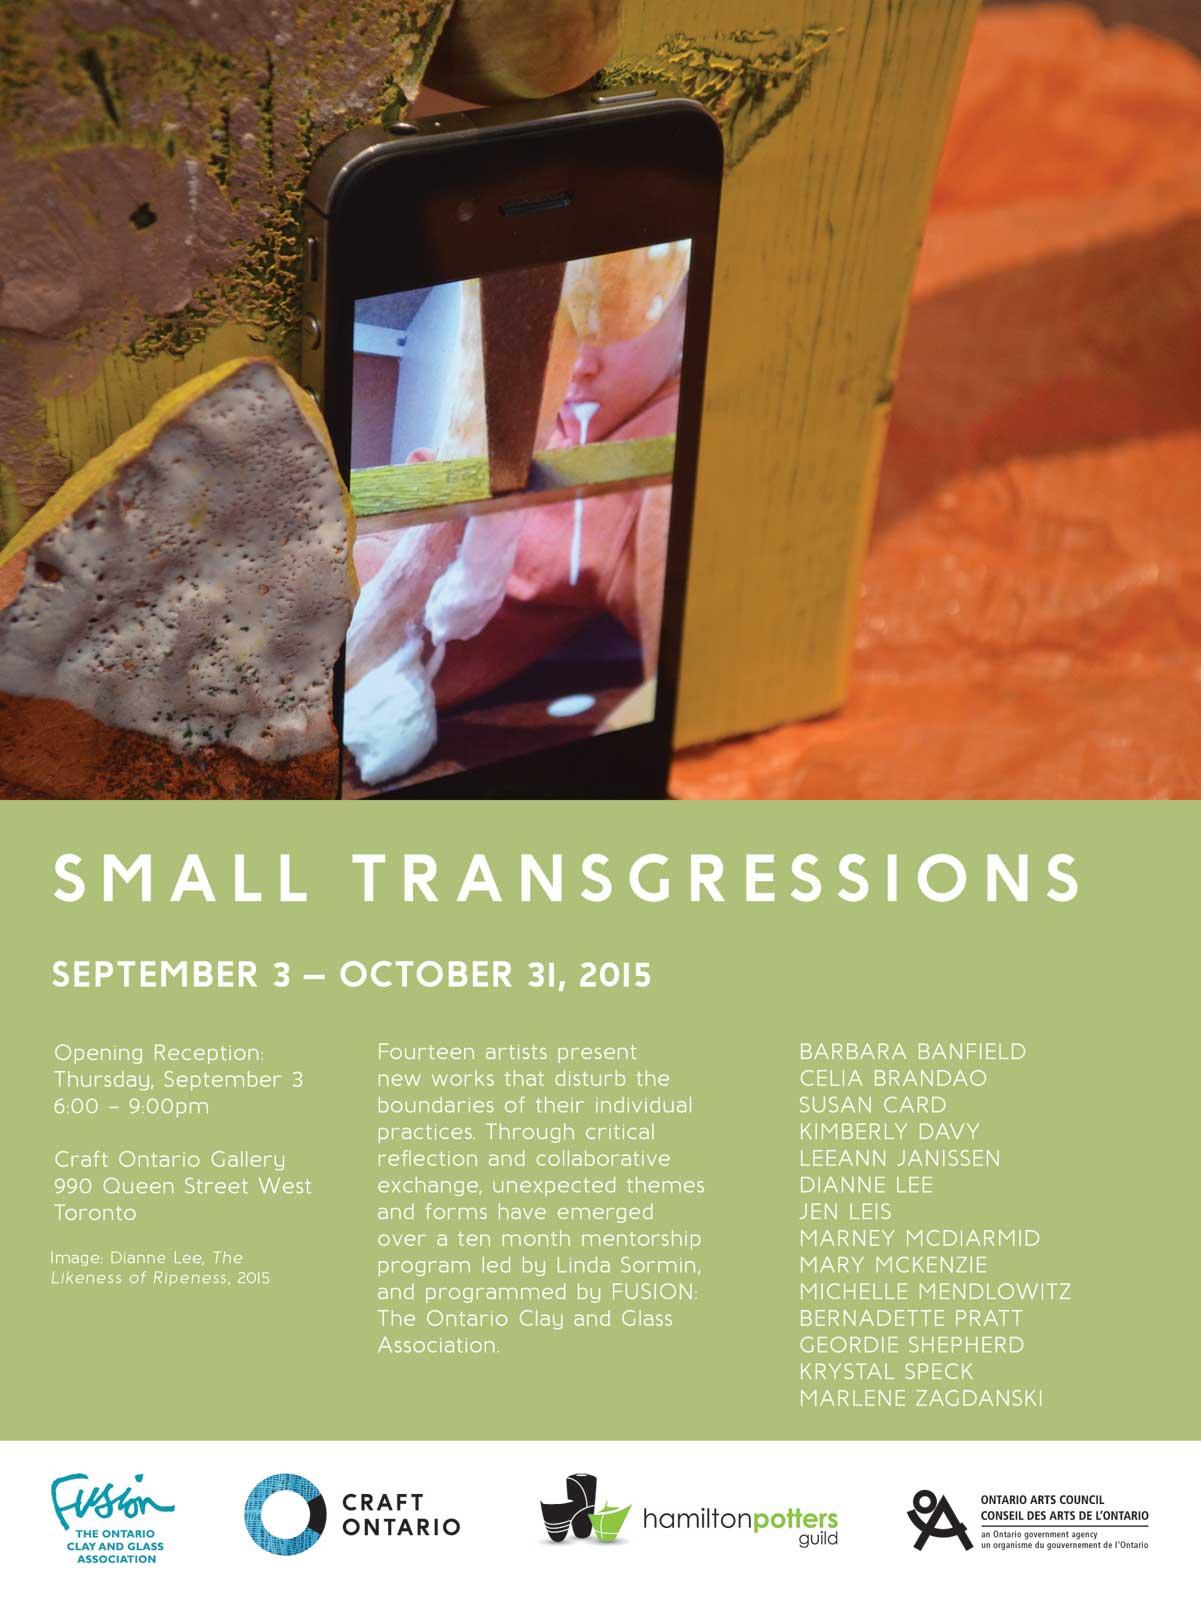 SmallTransgressions-Evite - Copy.jpg